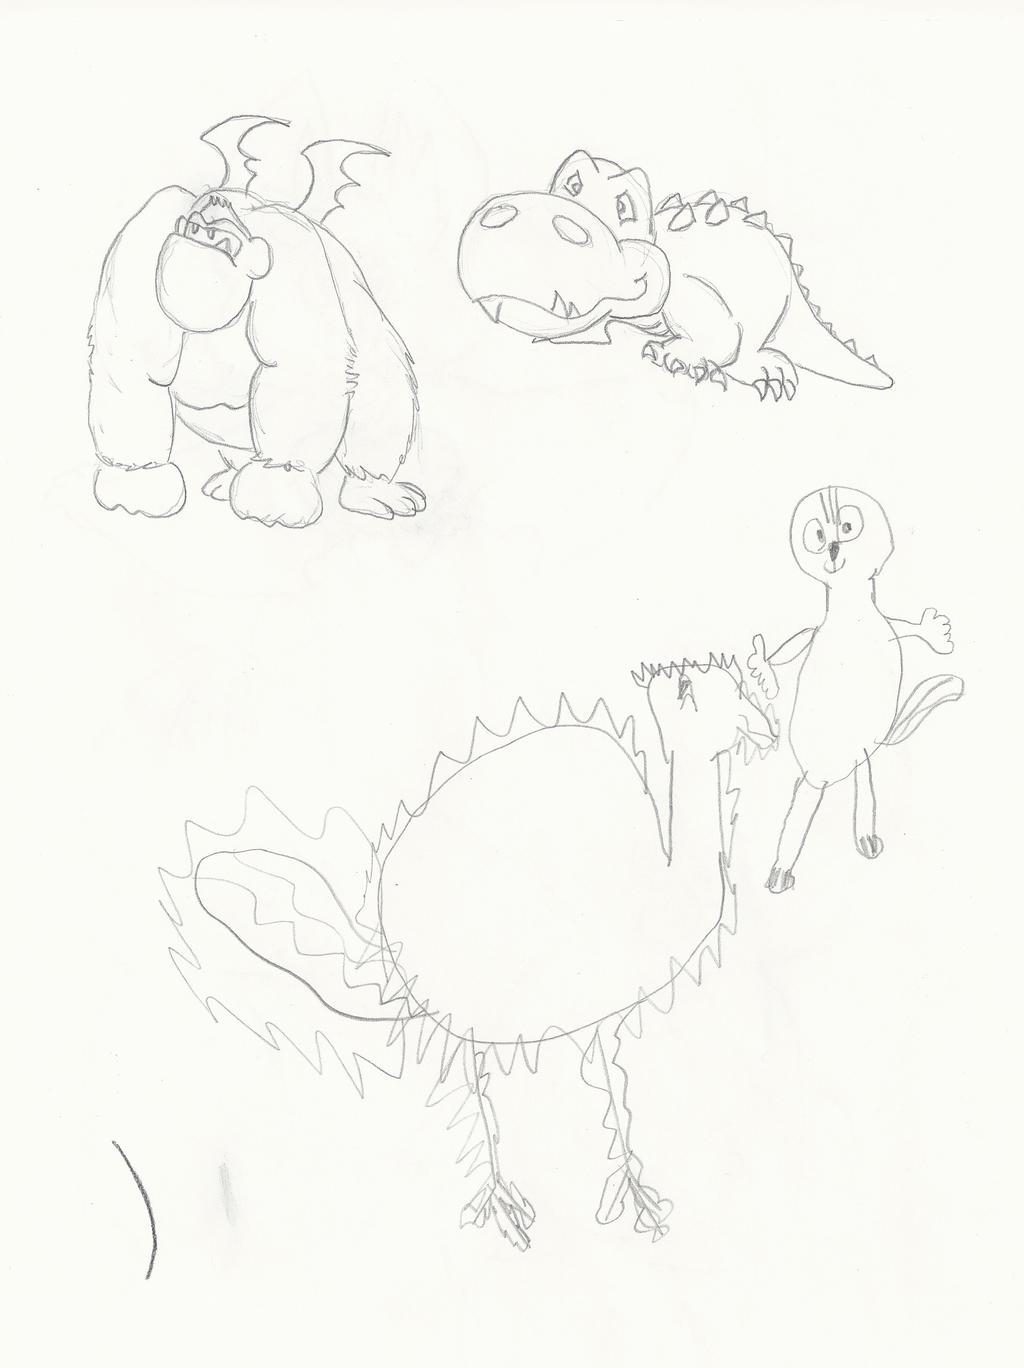 Animal Fusions - Sister Art Collab! by GECKO-Nuzlockes